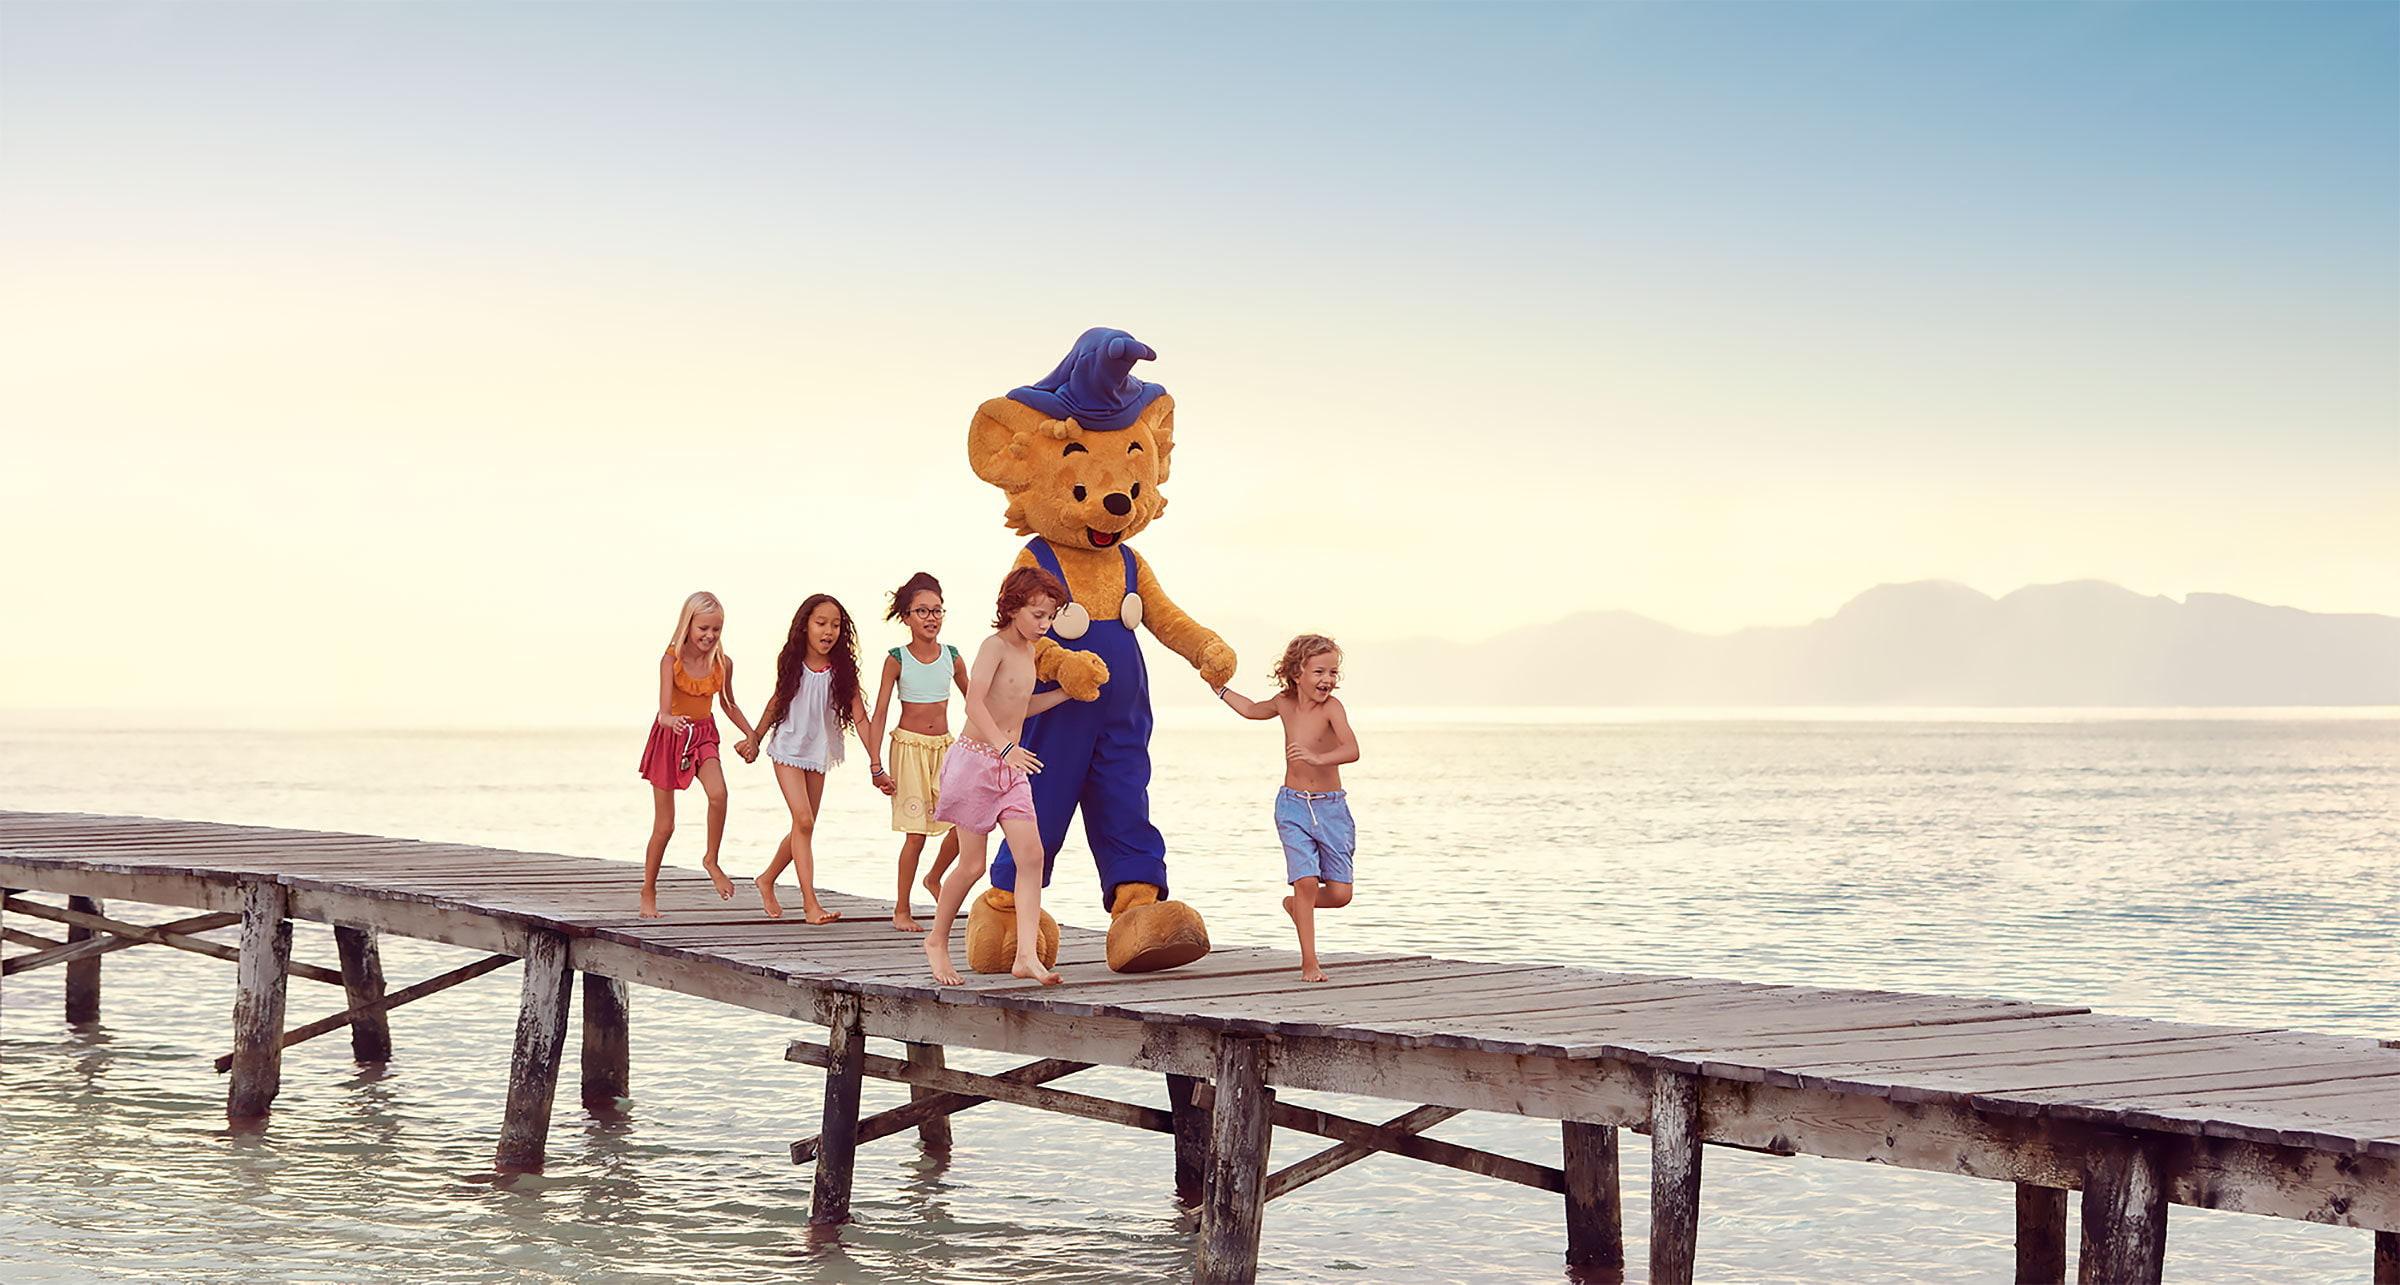 Hotellkedja i samarbete med Tui i sommar